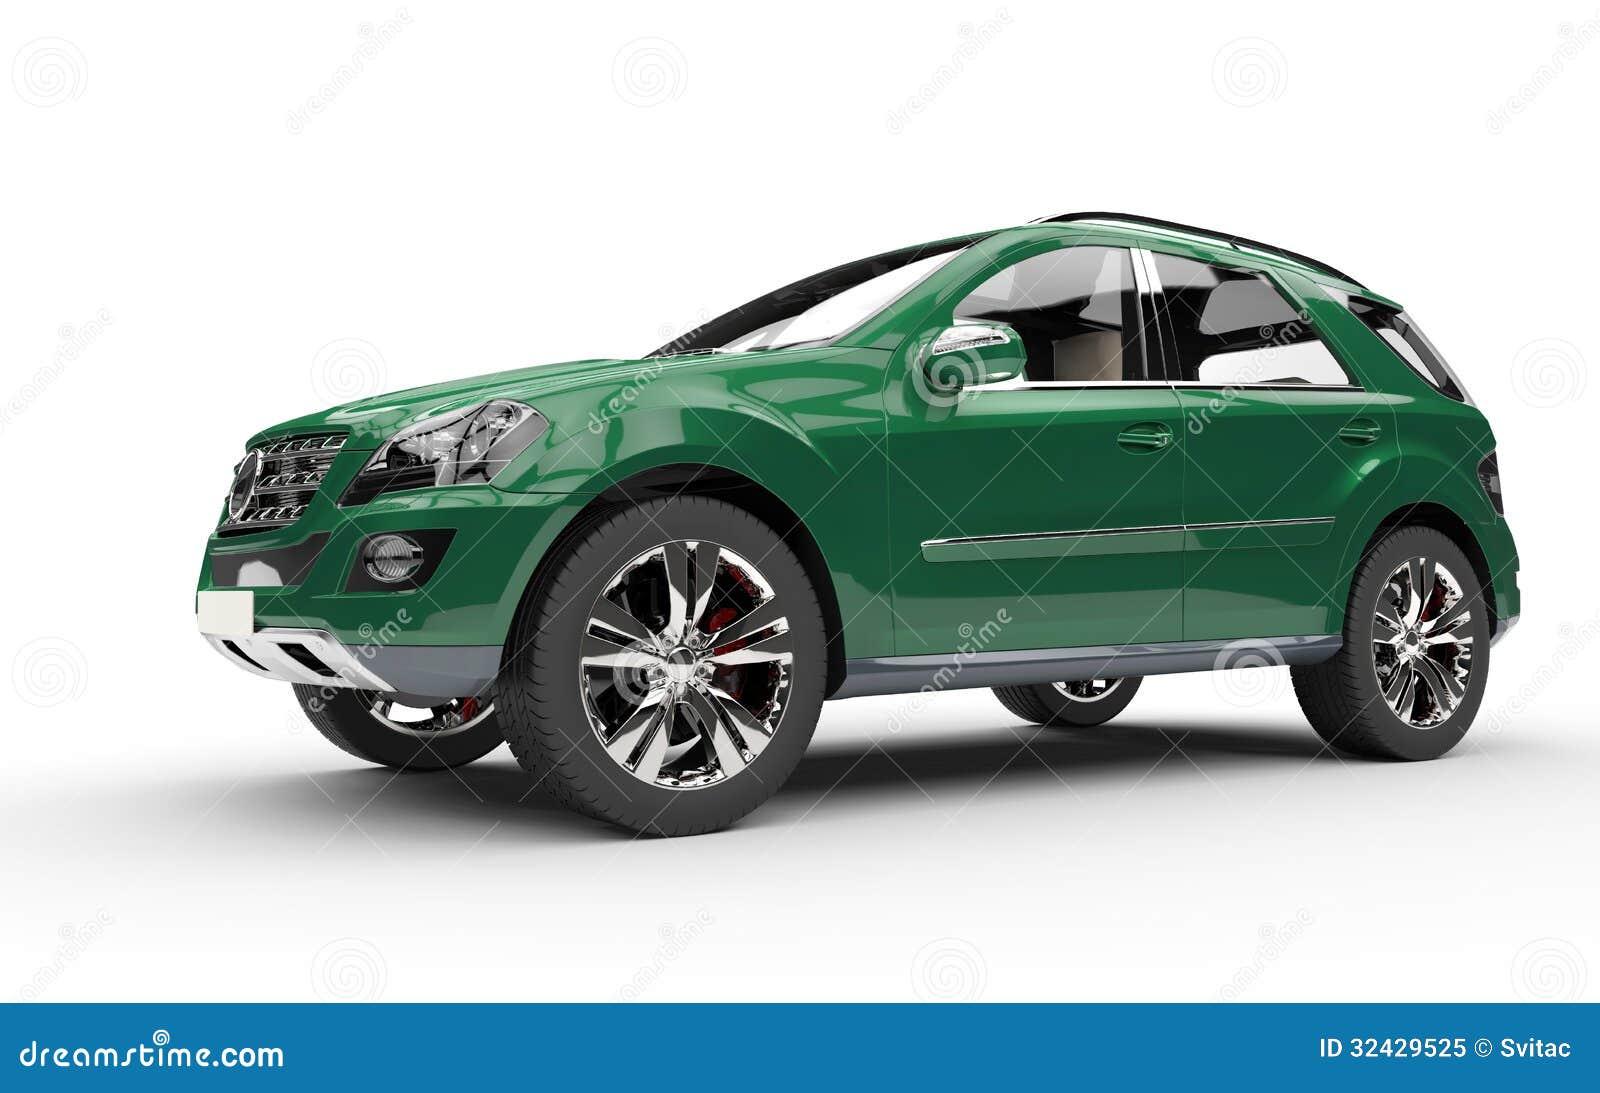 Dark Green Suv Royalty Free Stock Photo Image 32429525